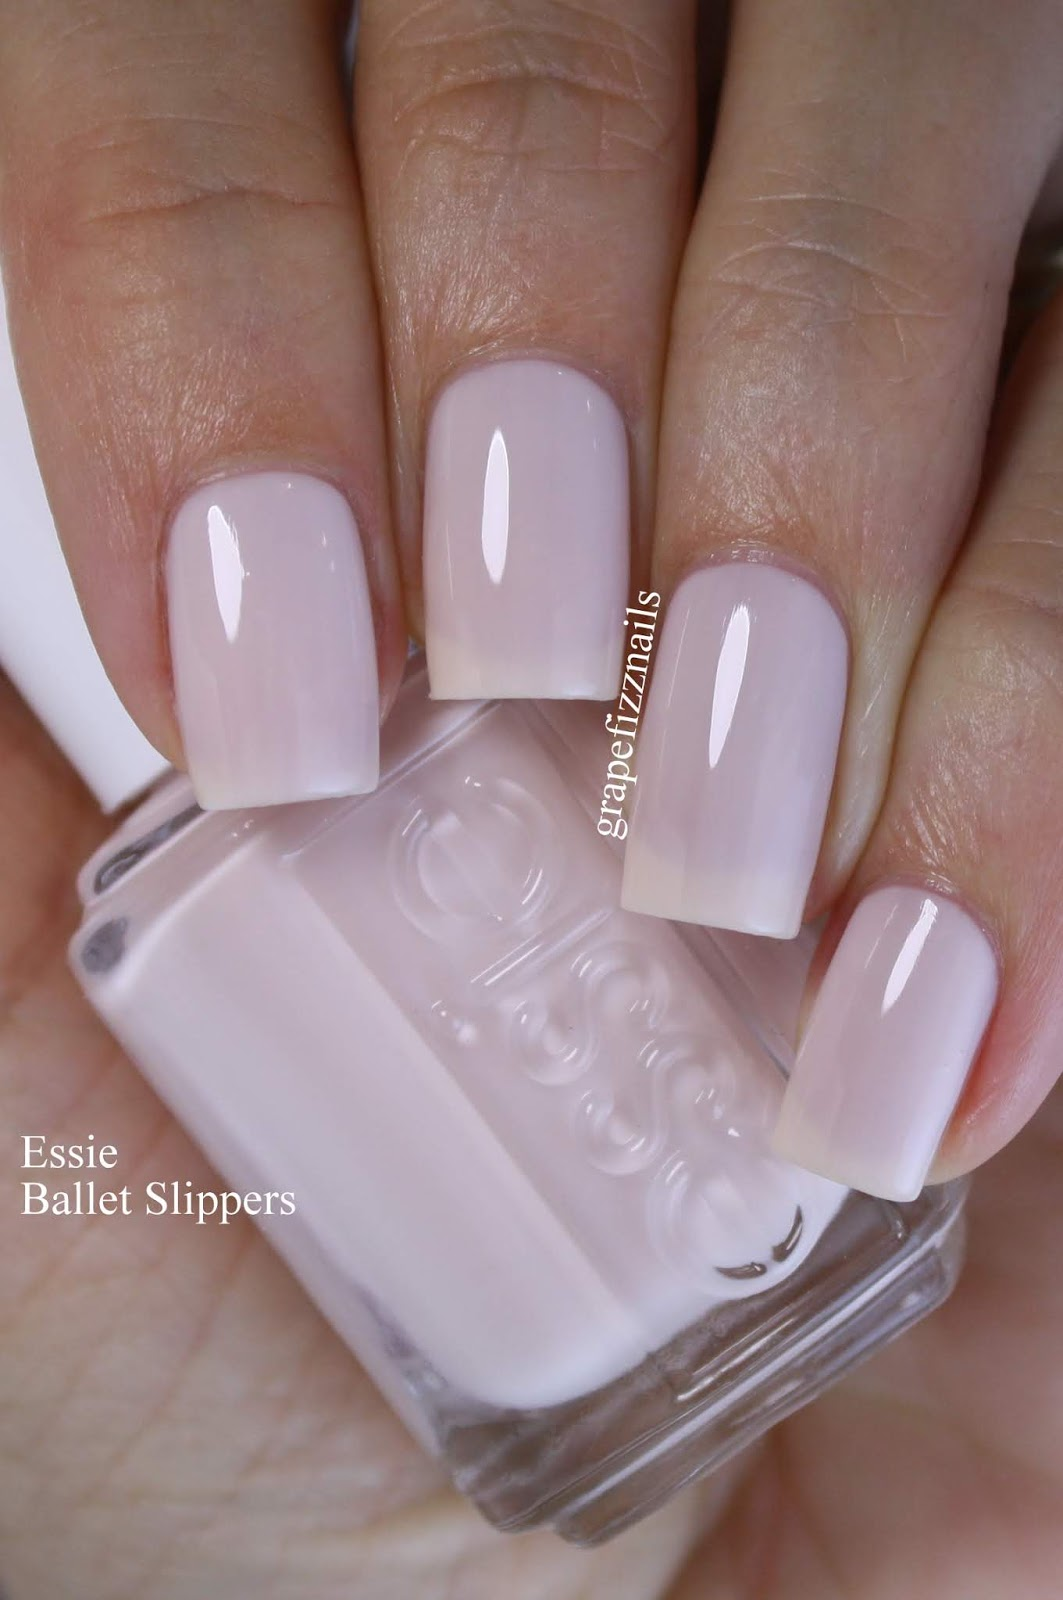 Grape Fizz Nails: Essie Ballet Slippers